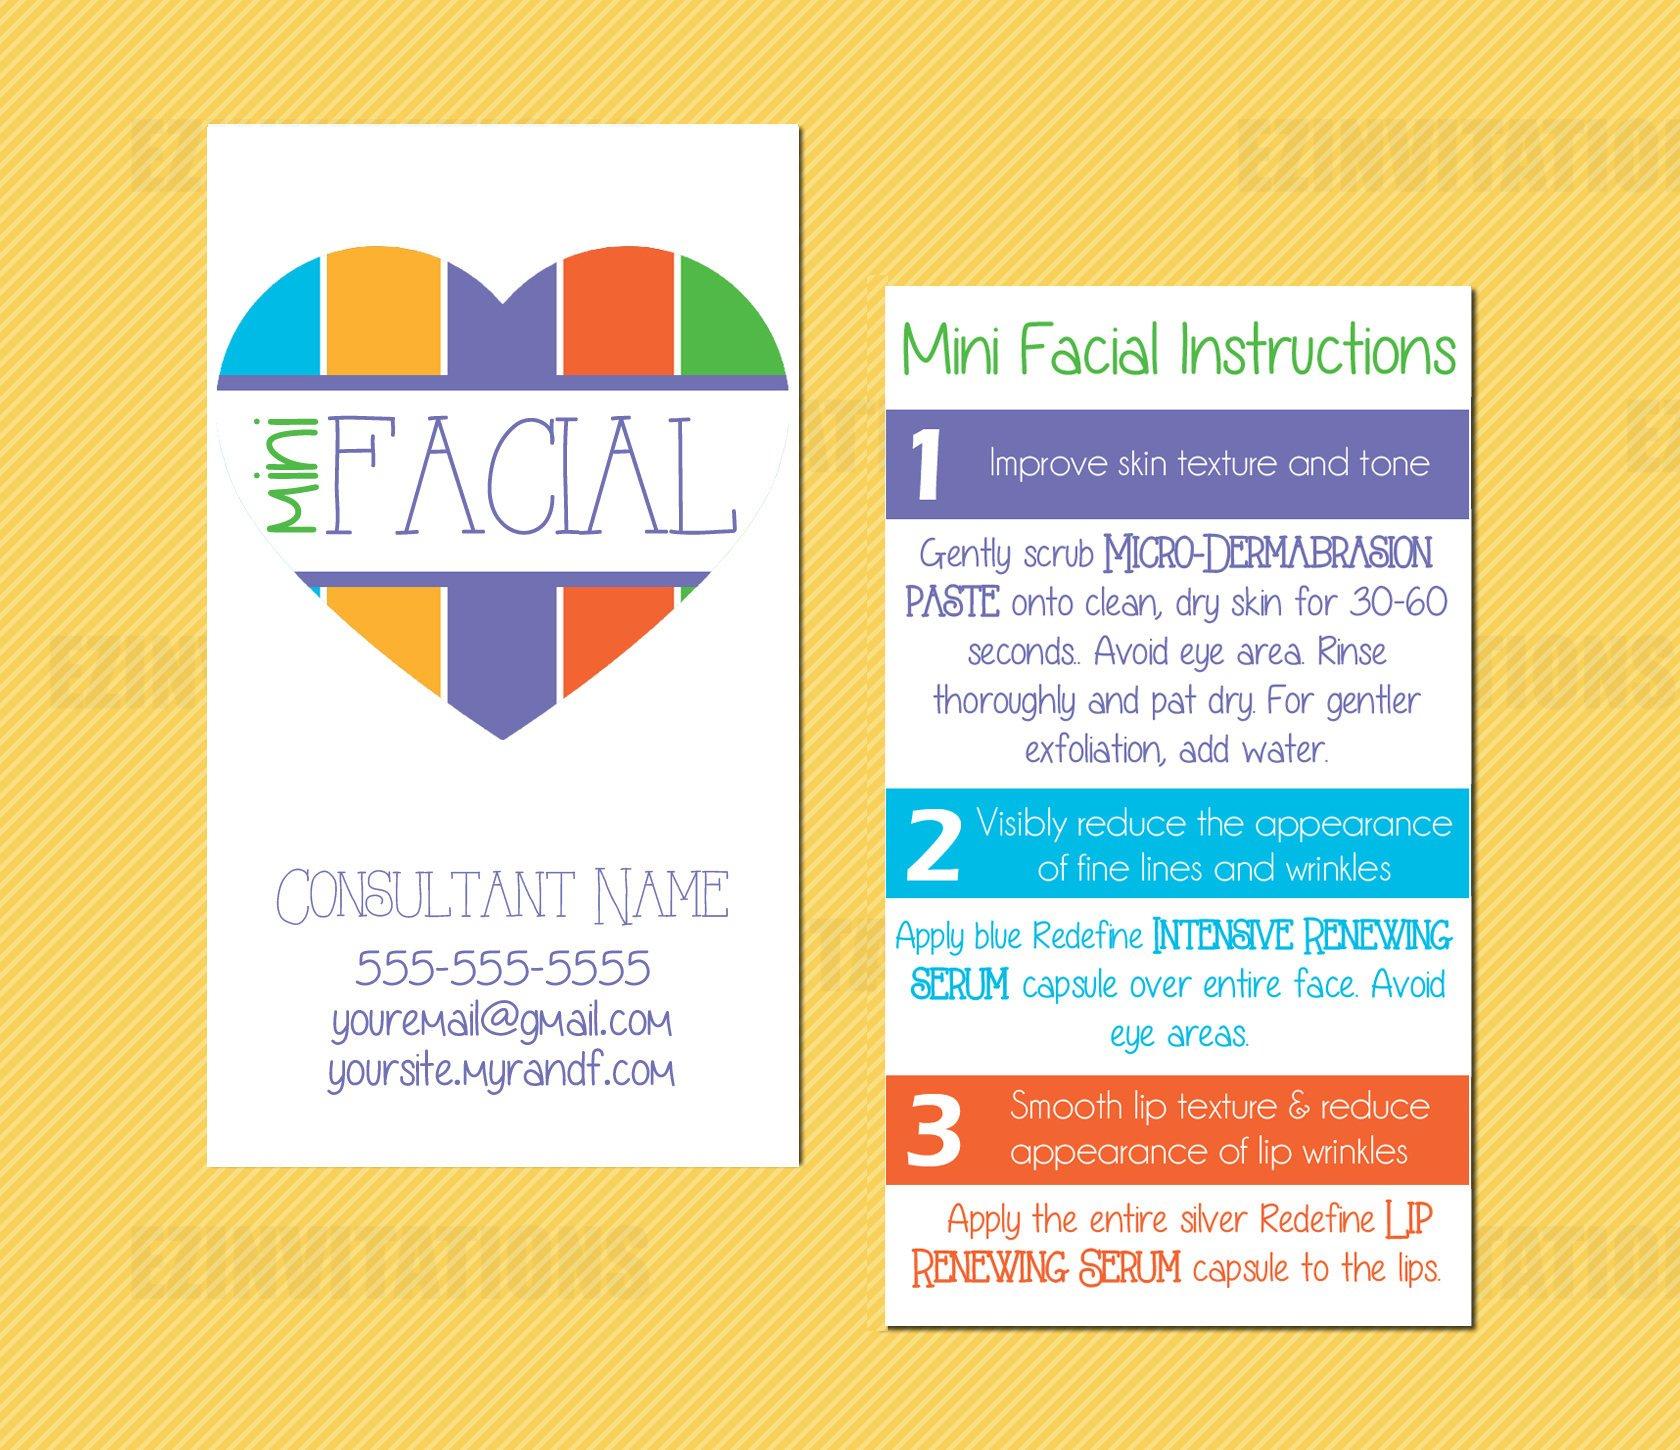 Rodan And Fields Mini Facial Card Rf Mini Facial Heart Instruction - Rodan And Fields Mini Facial Instructions Printable Free